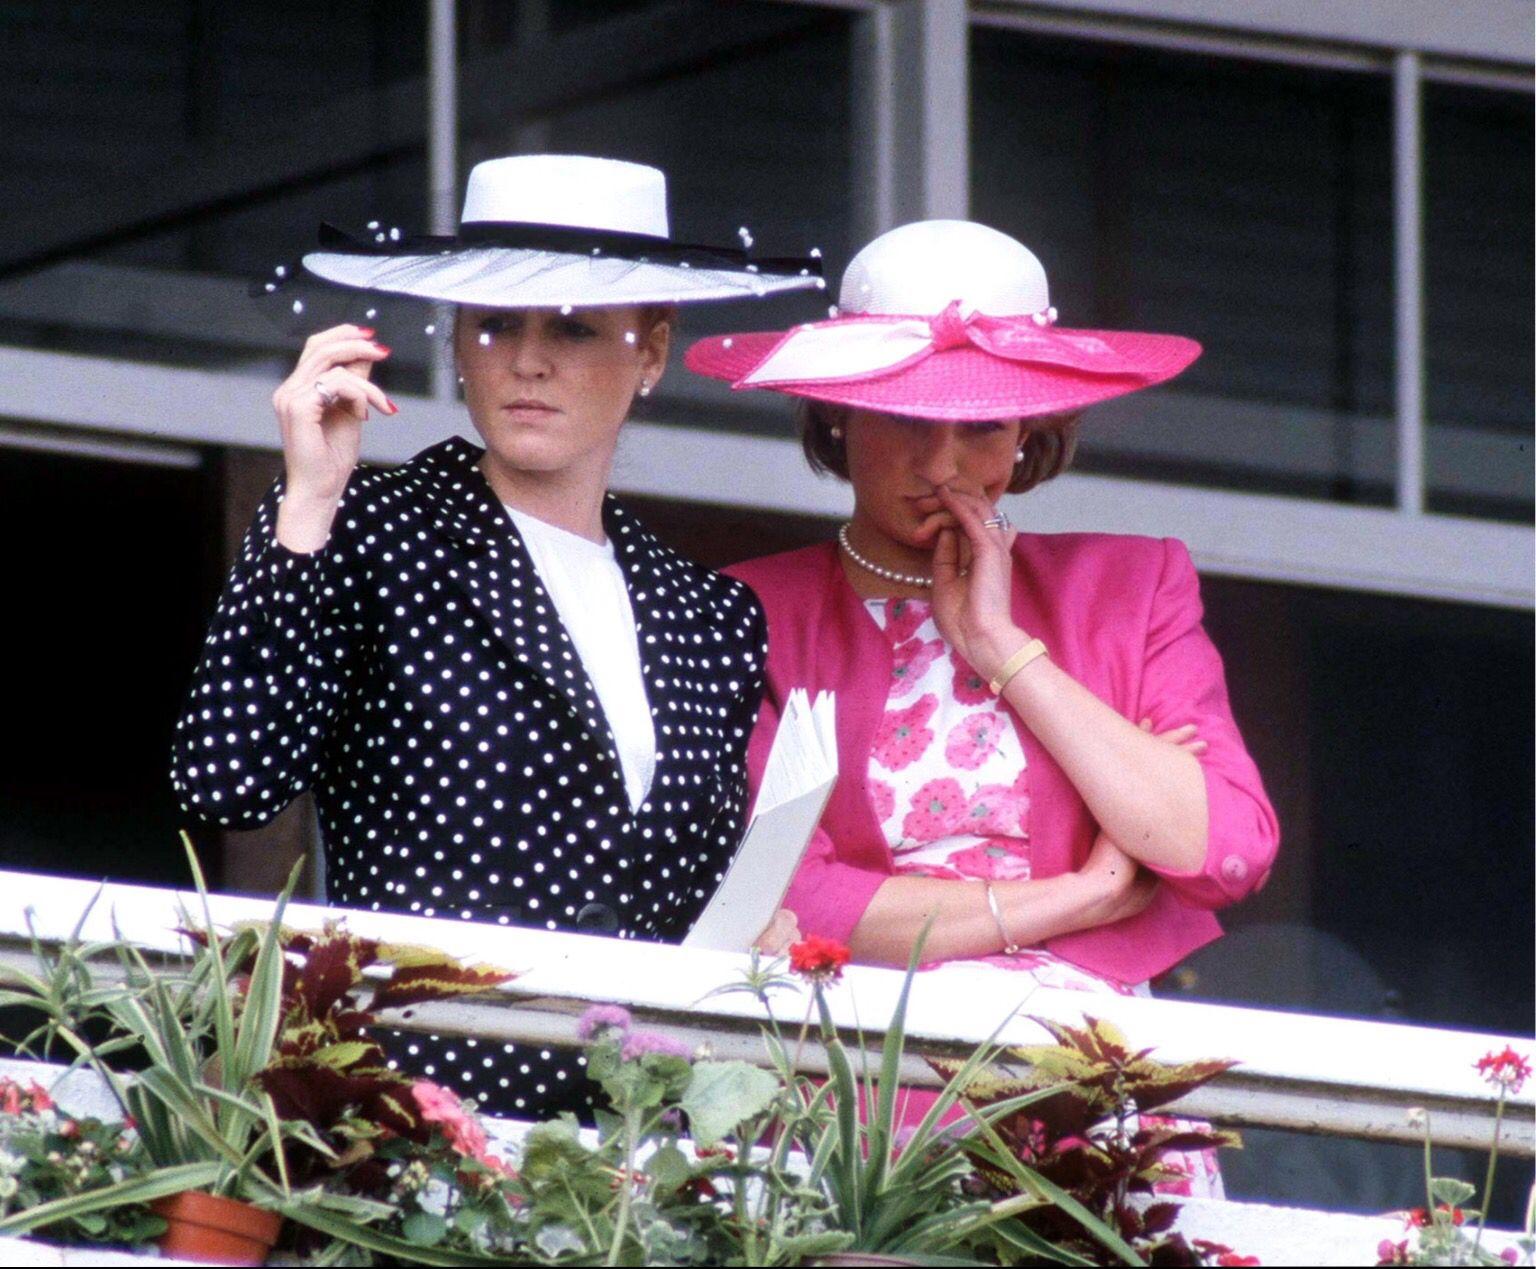 Princess Diana And Duchess of York 1987 Sarah duchess of